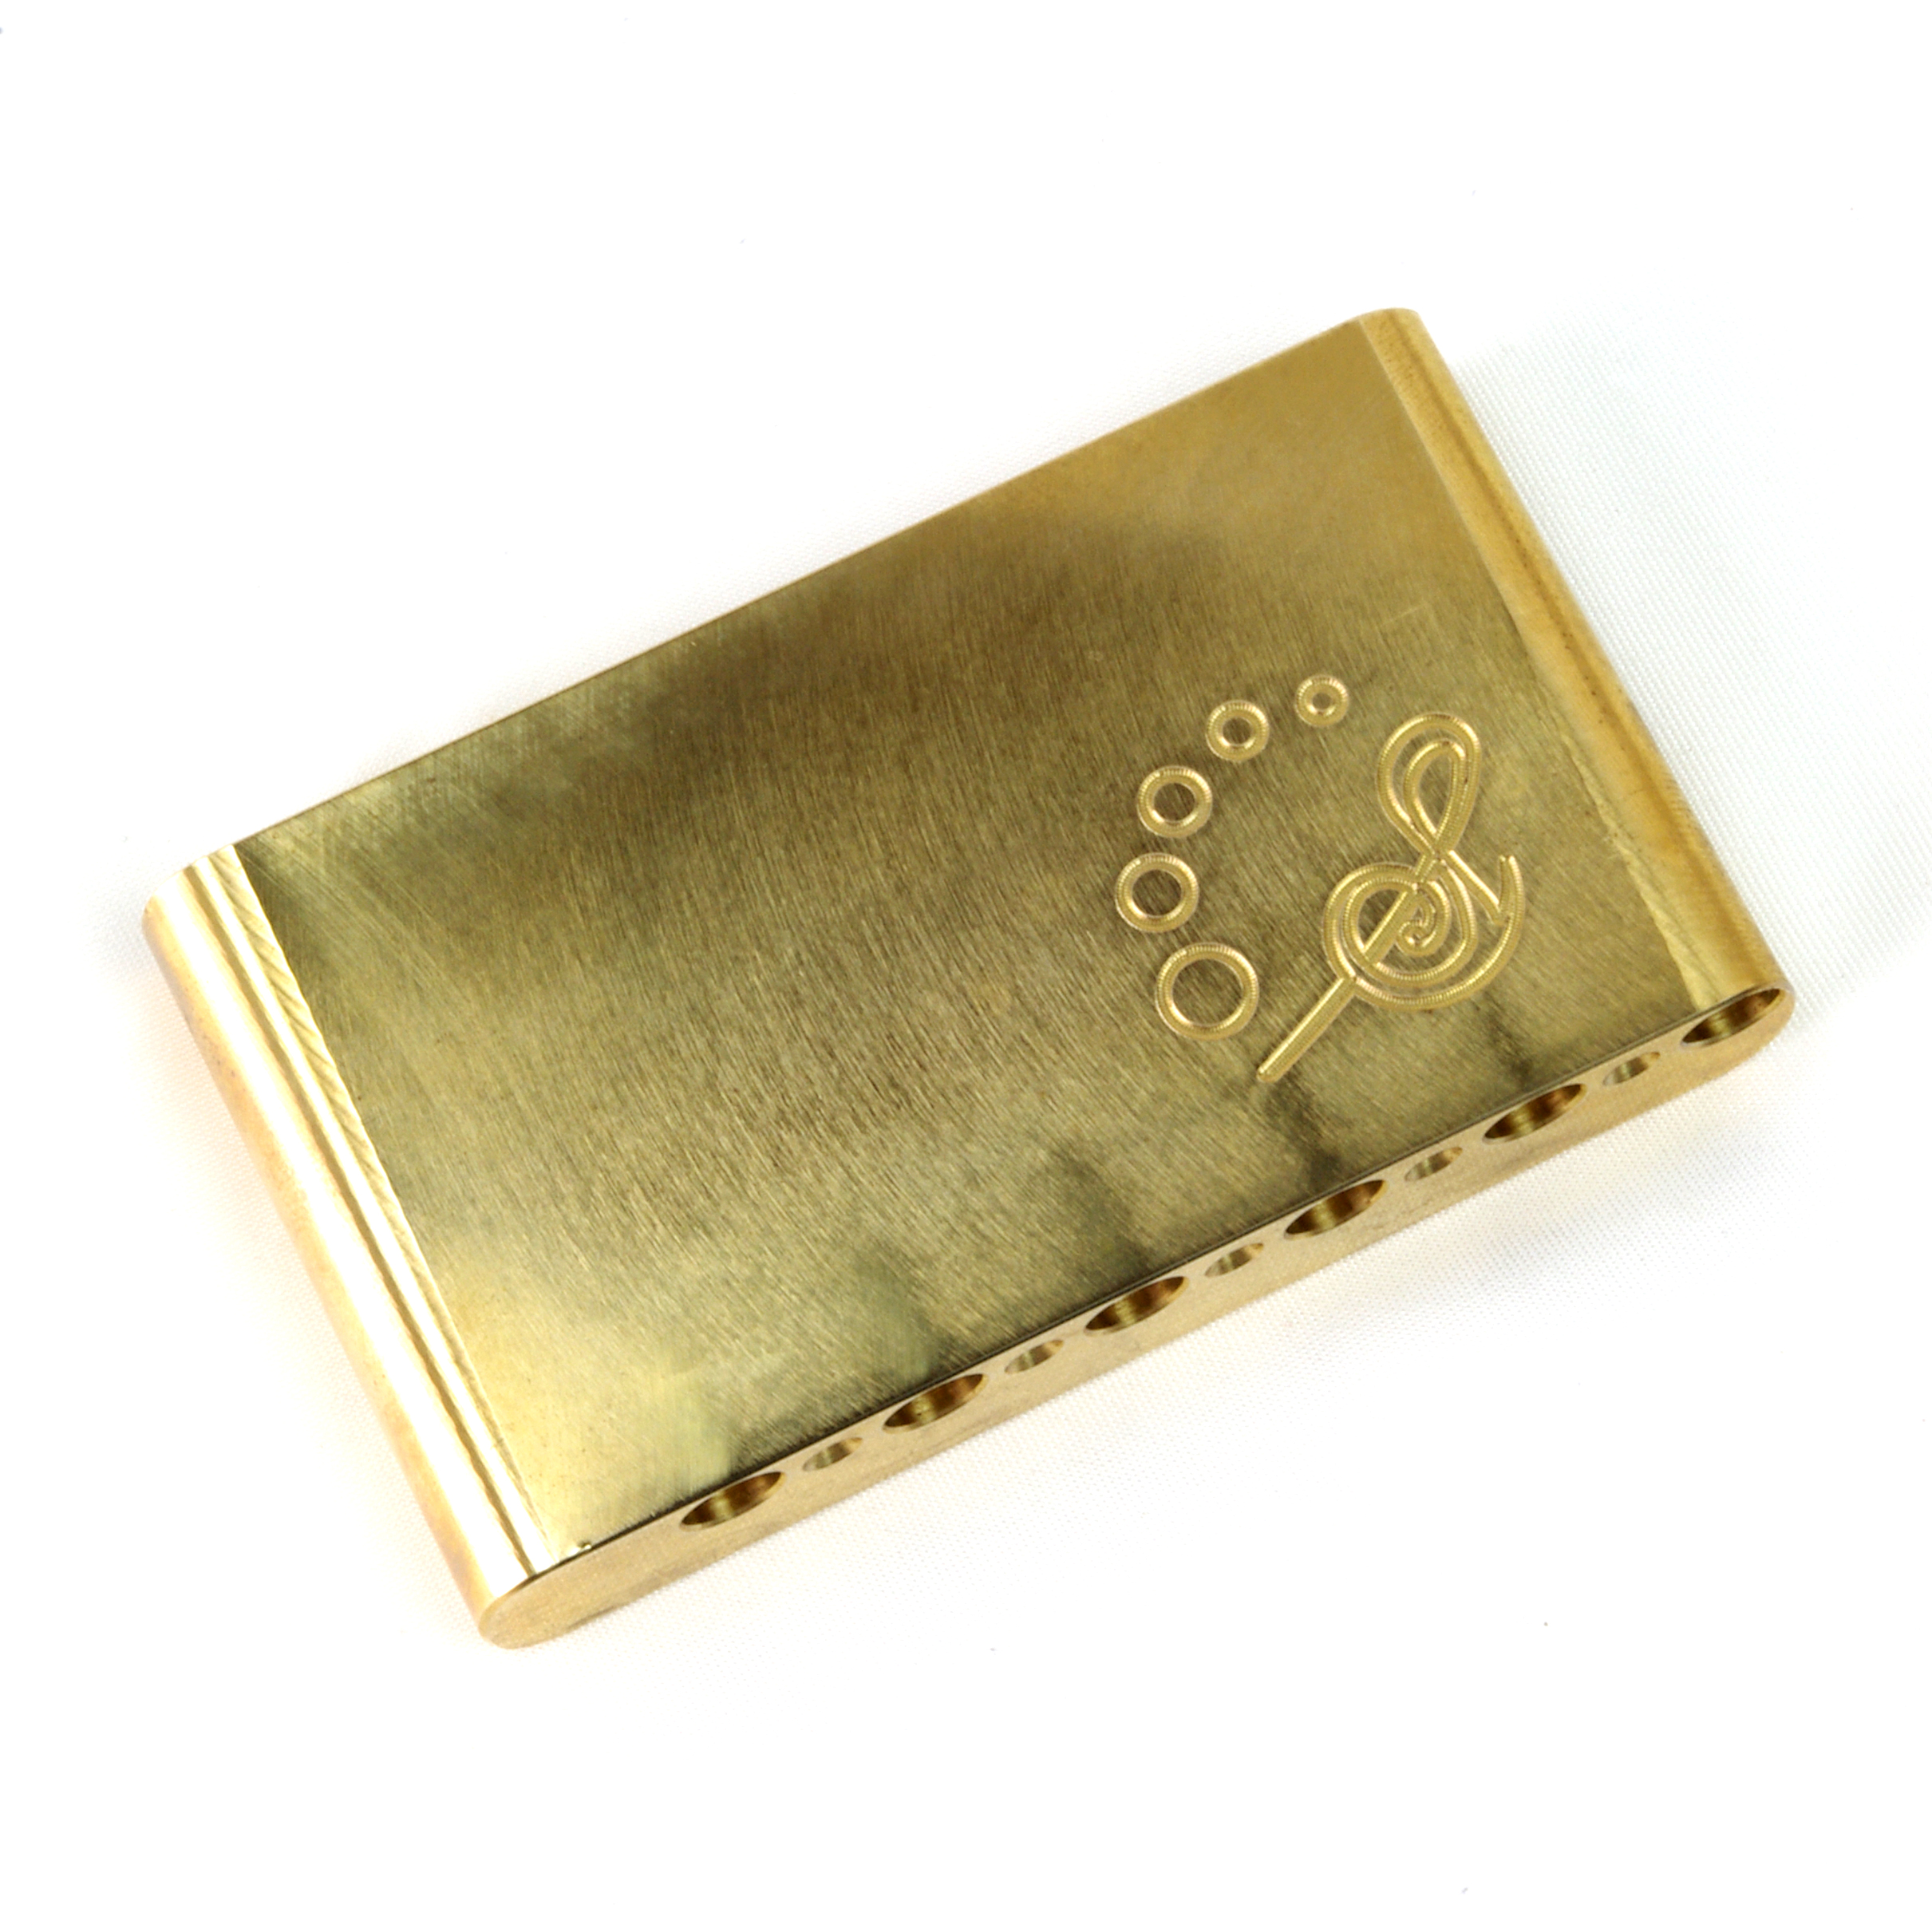 Sago(サゴ) トレモロブロック Inertia Block Brass (Gotoh GE101T互換品)サスティーン向上